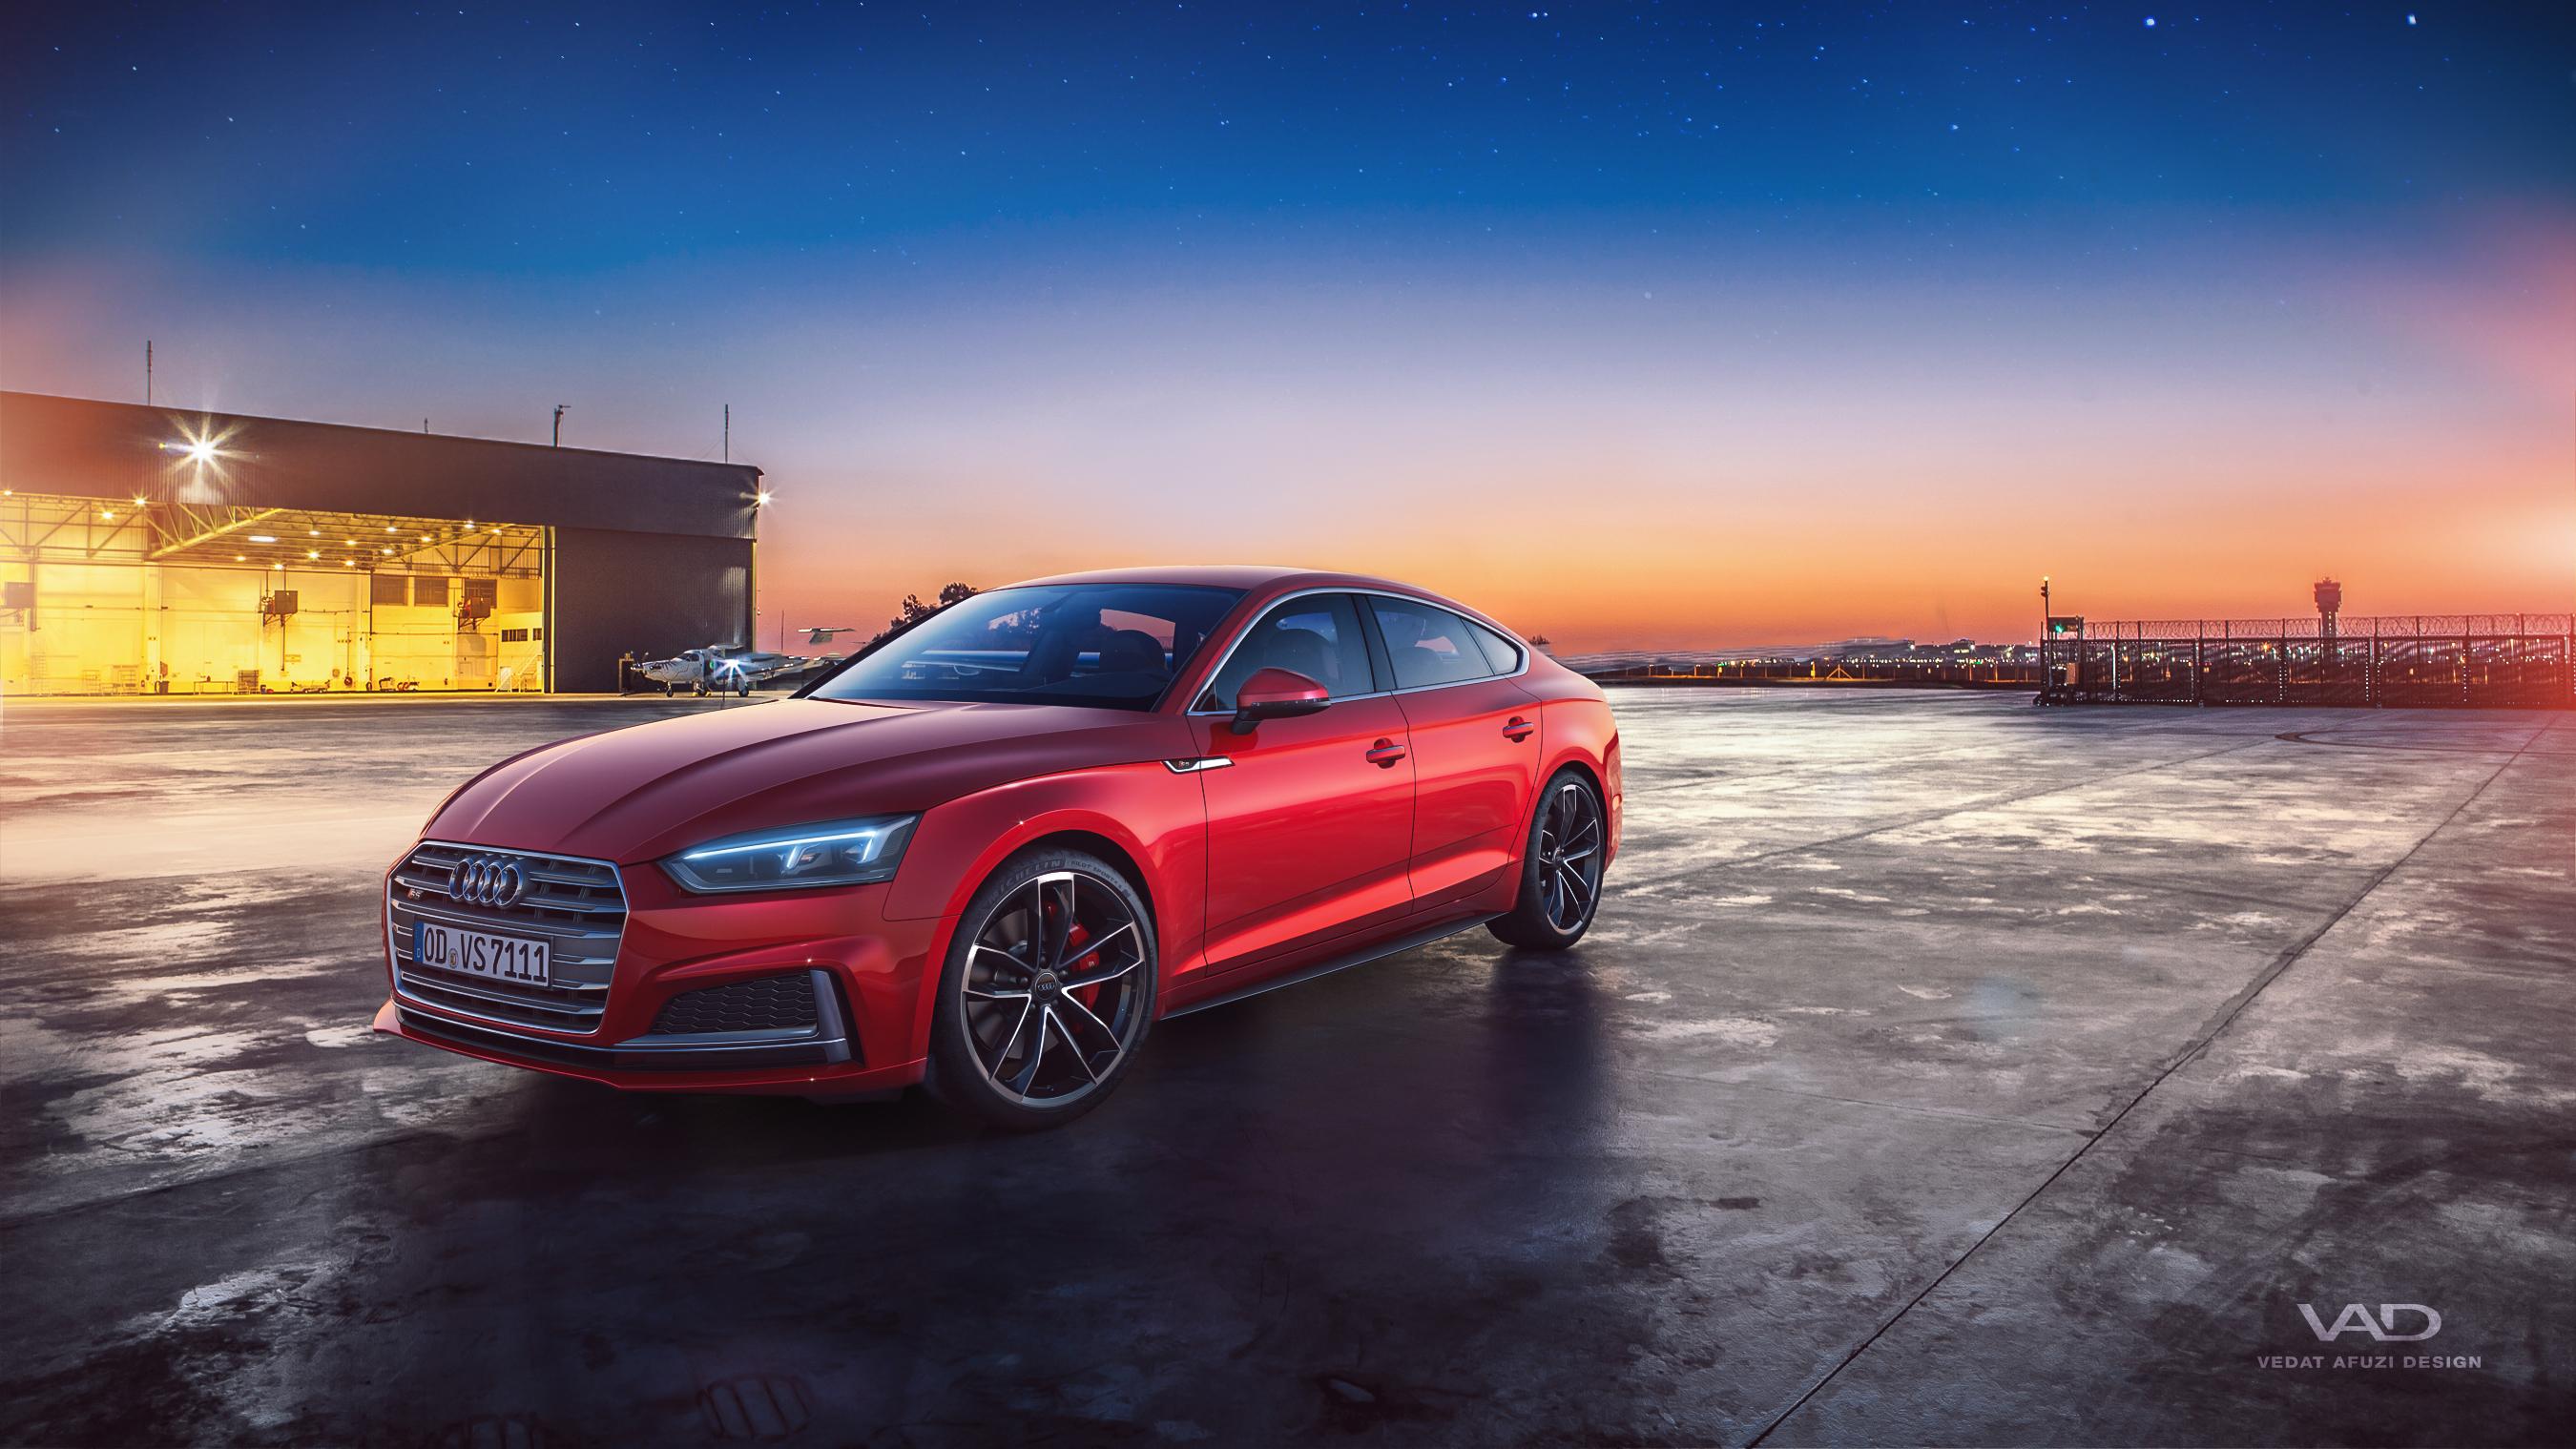 2017 Audi R8 Iphone Wallpaper Audi S5 Sportback Cgi Wallpaper Hd Car Wallpapers Id 8404